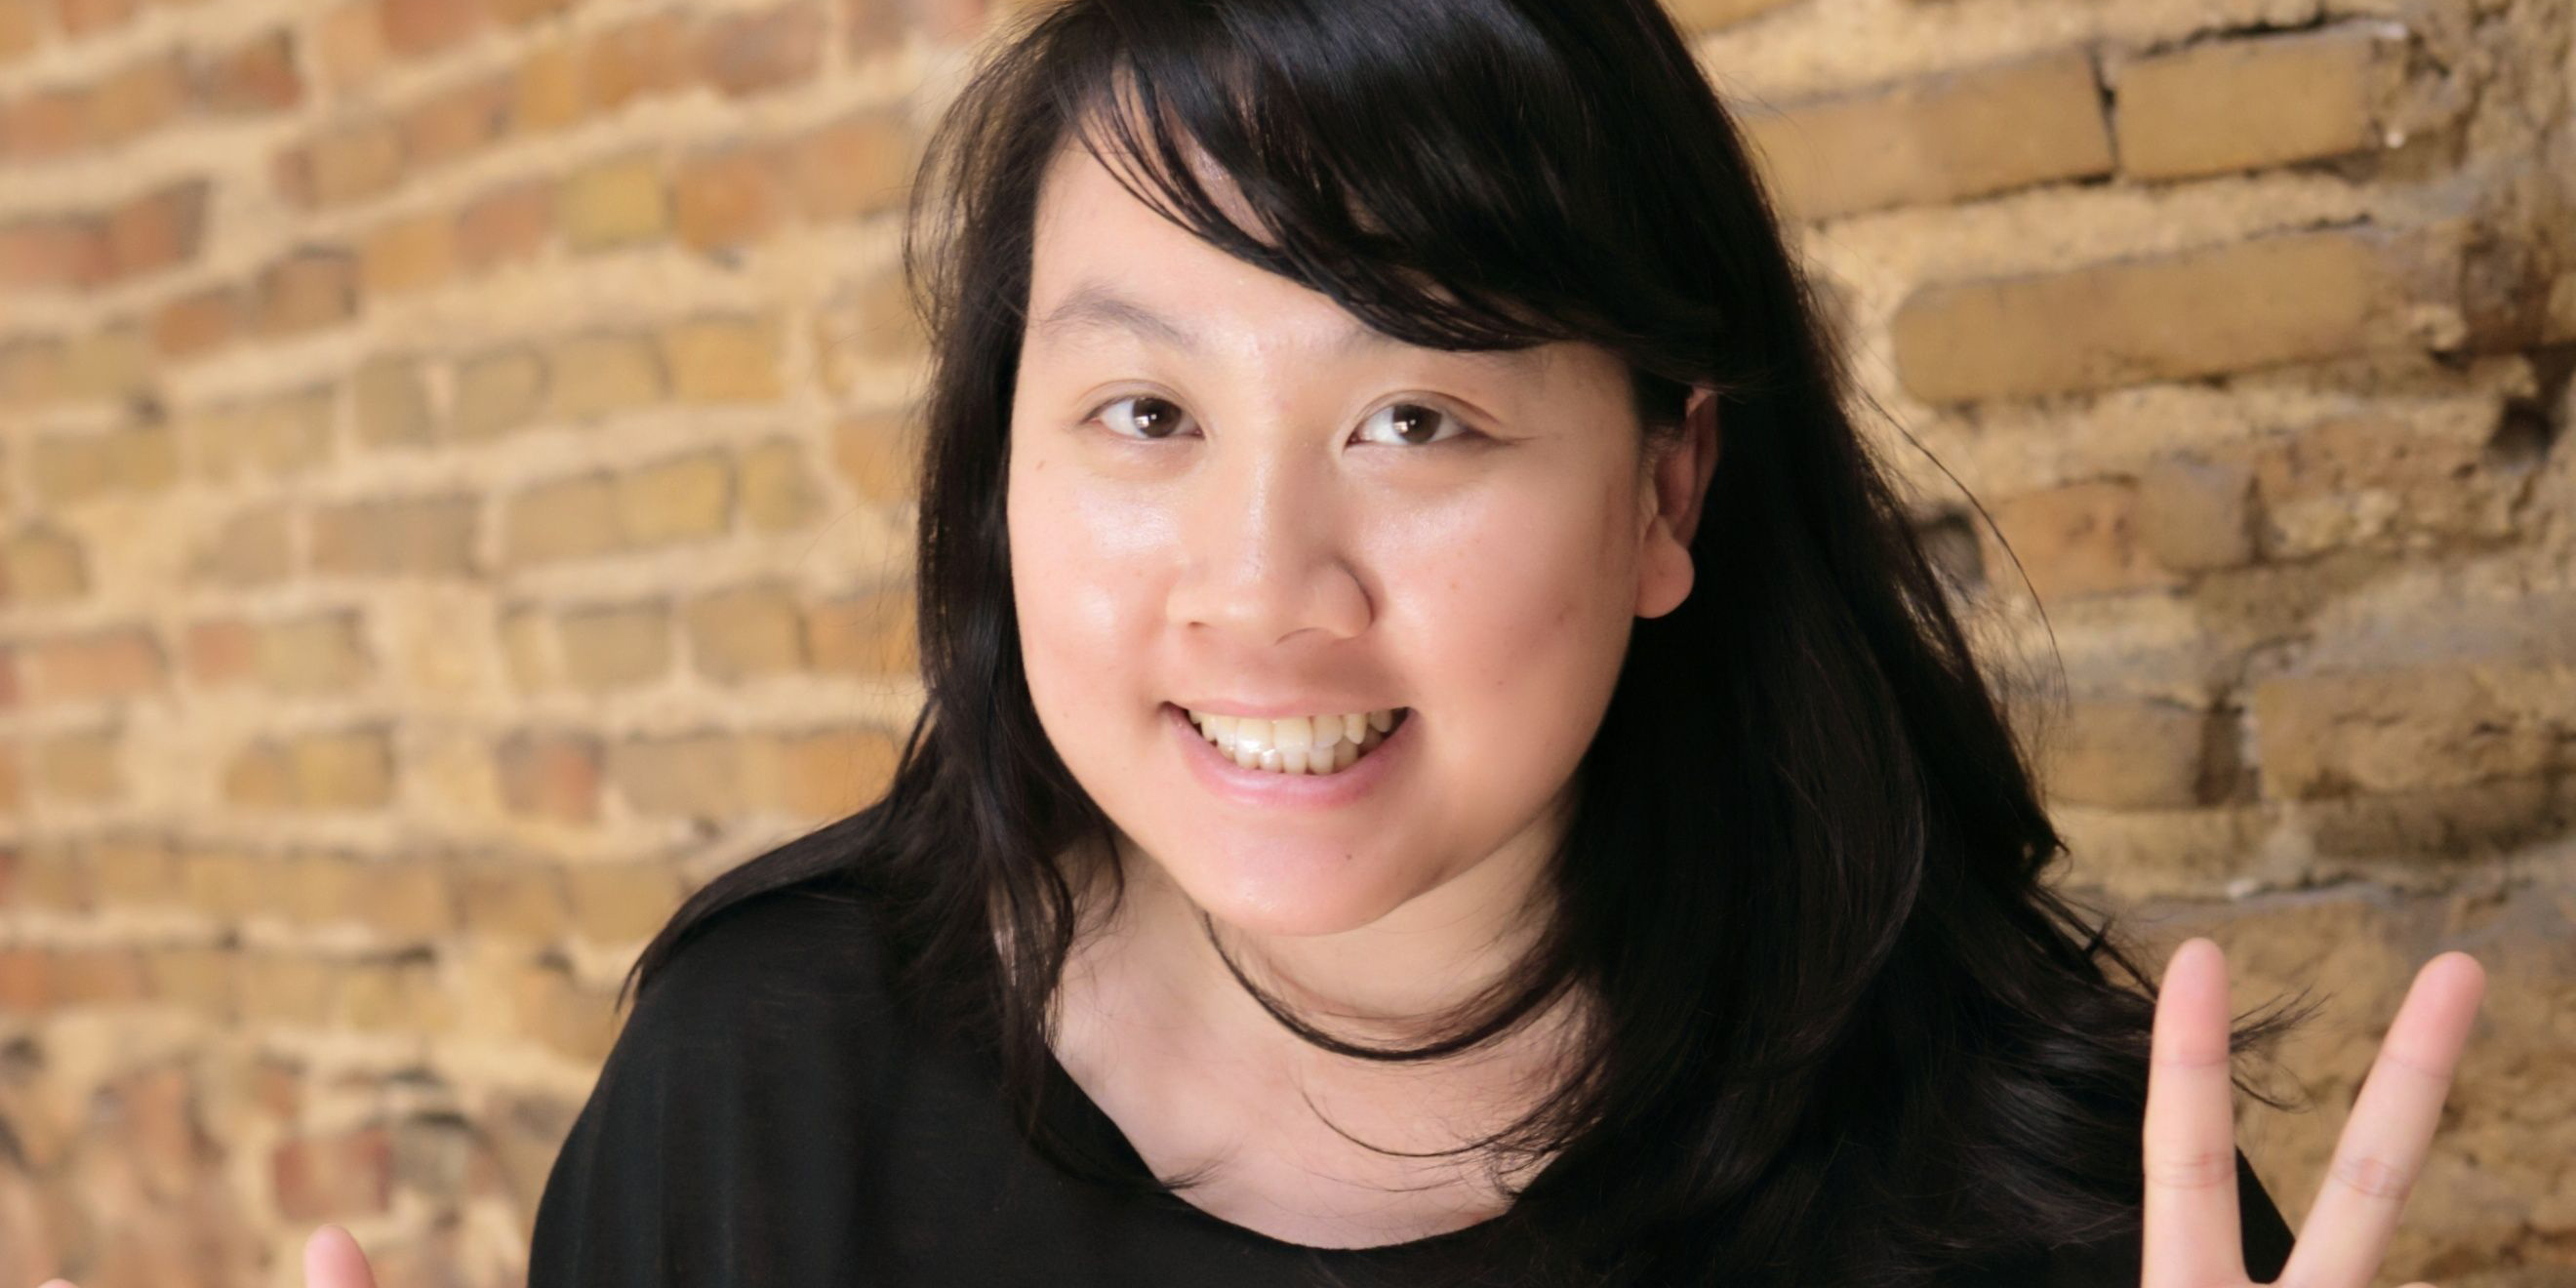 Kristin Cheung, Canada, participant in the GCLP 2017 edition